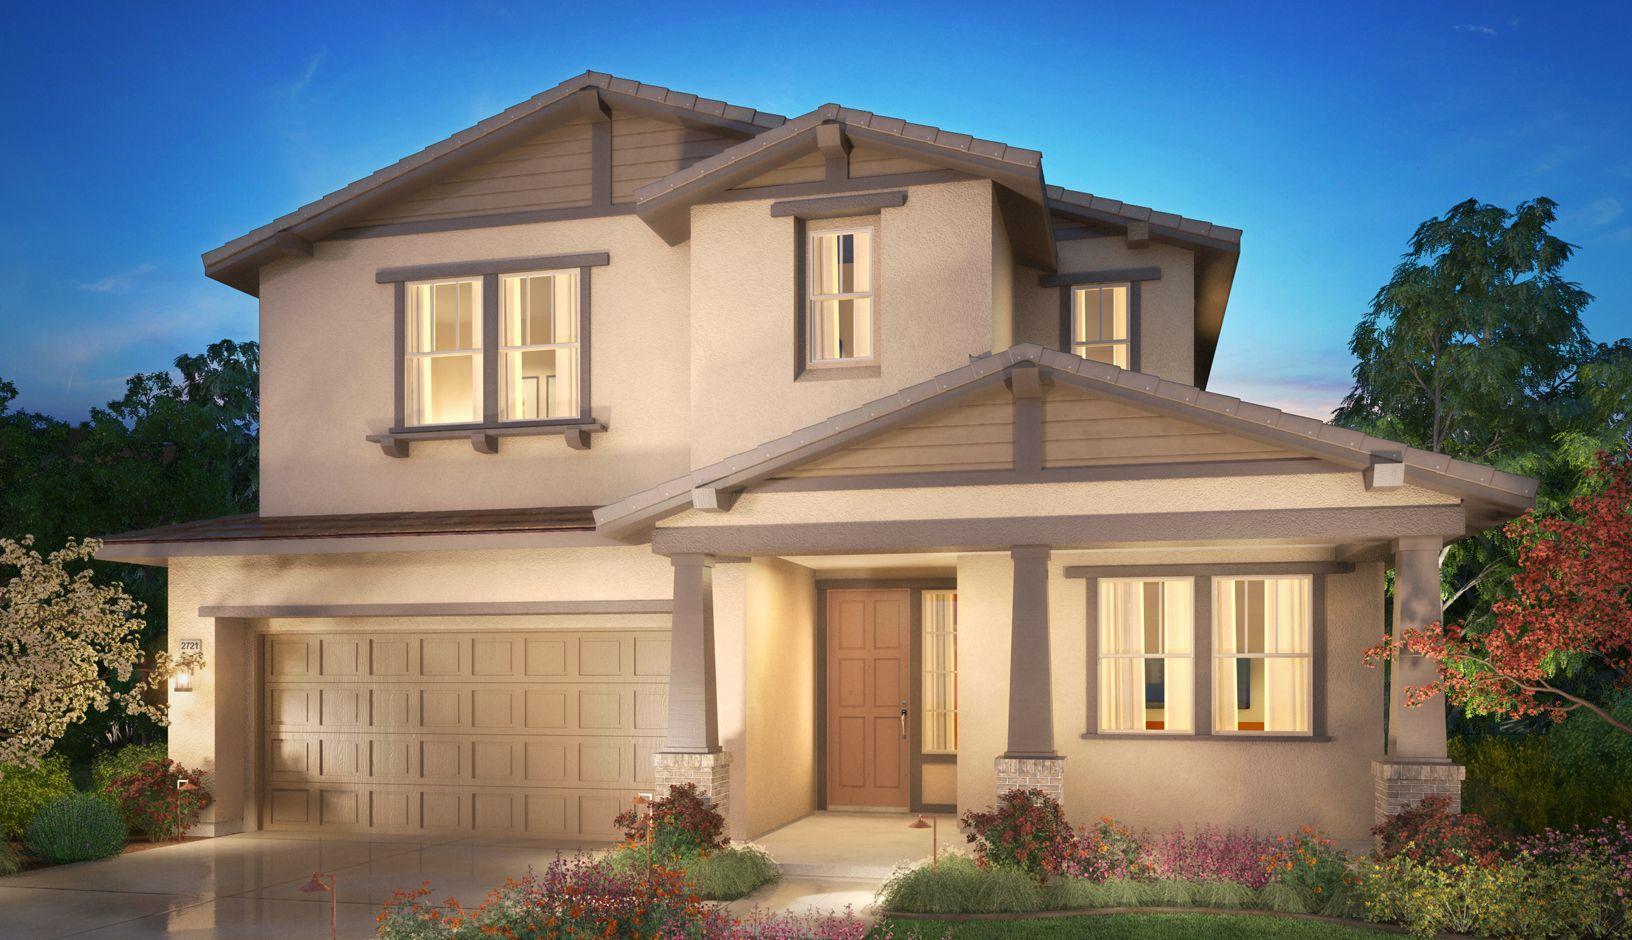 8019 Claret Court, Vacaville, CA Homes & Land - Real Estate